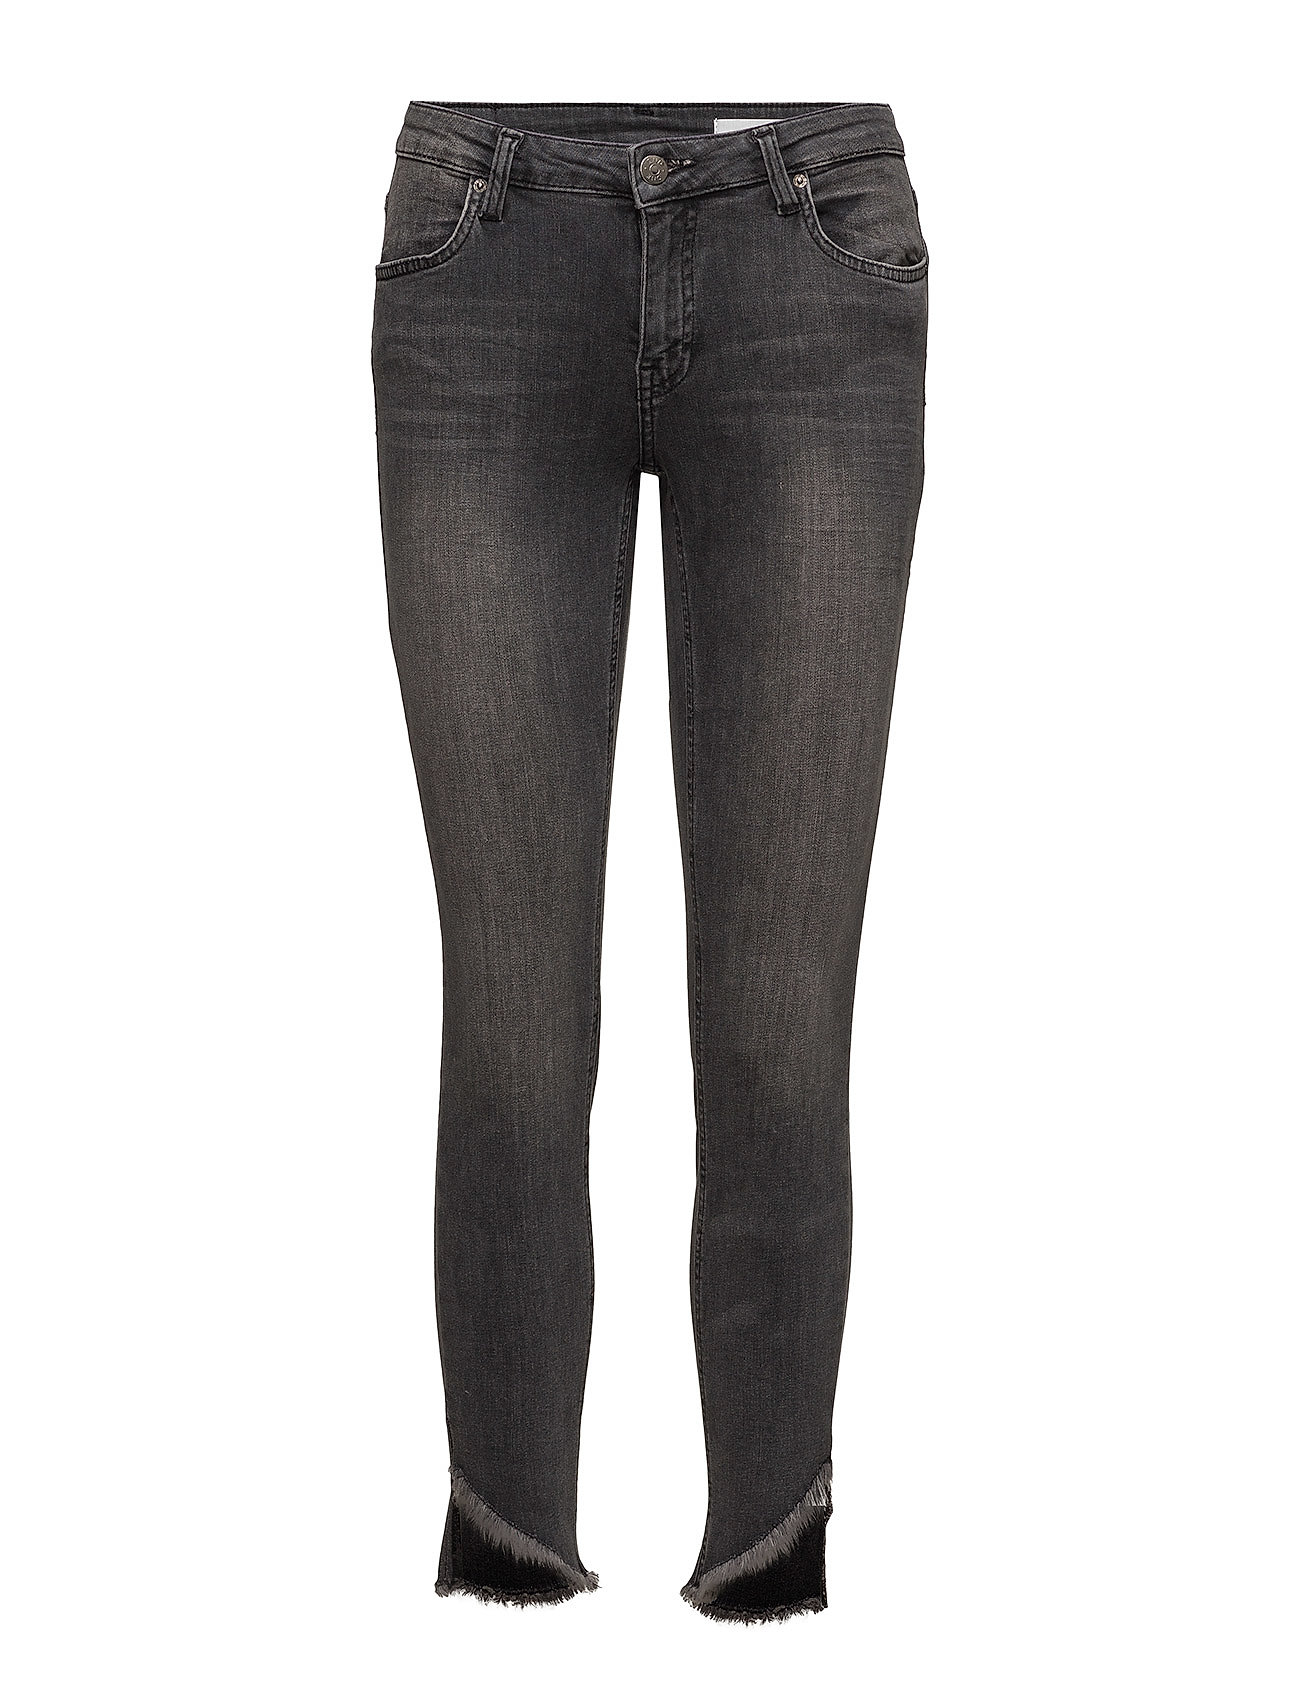 2nd one Nicole 834 crop, raw trashed grey, jeans på boozt.com dk